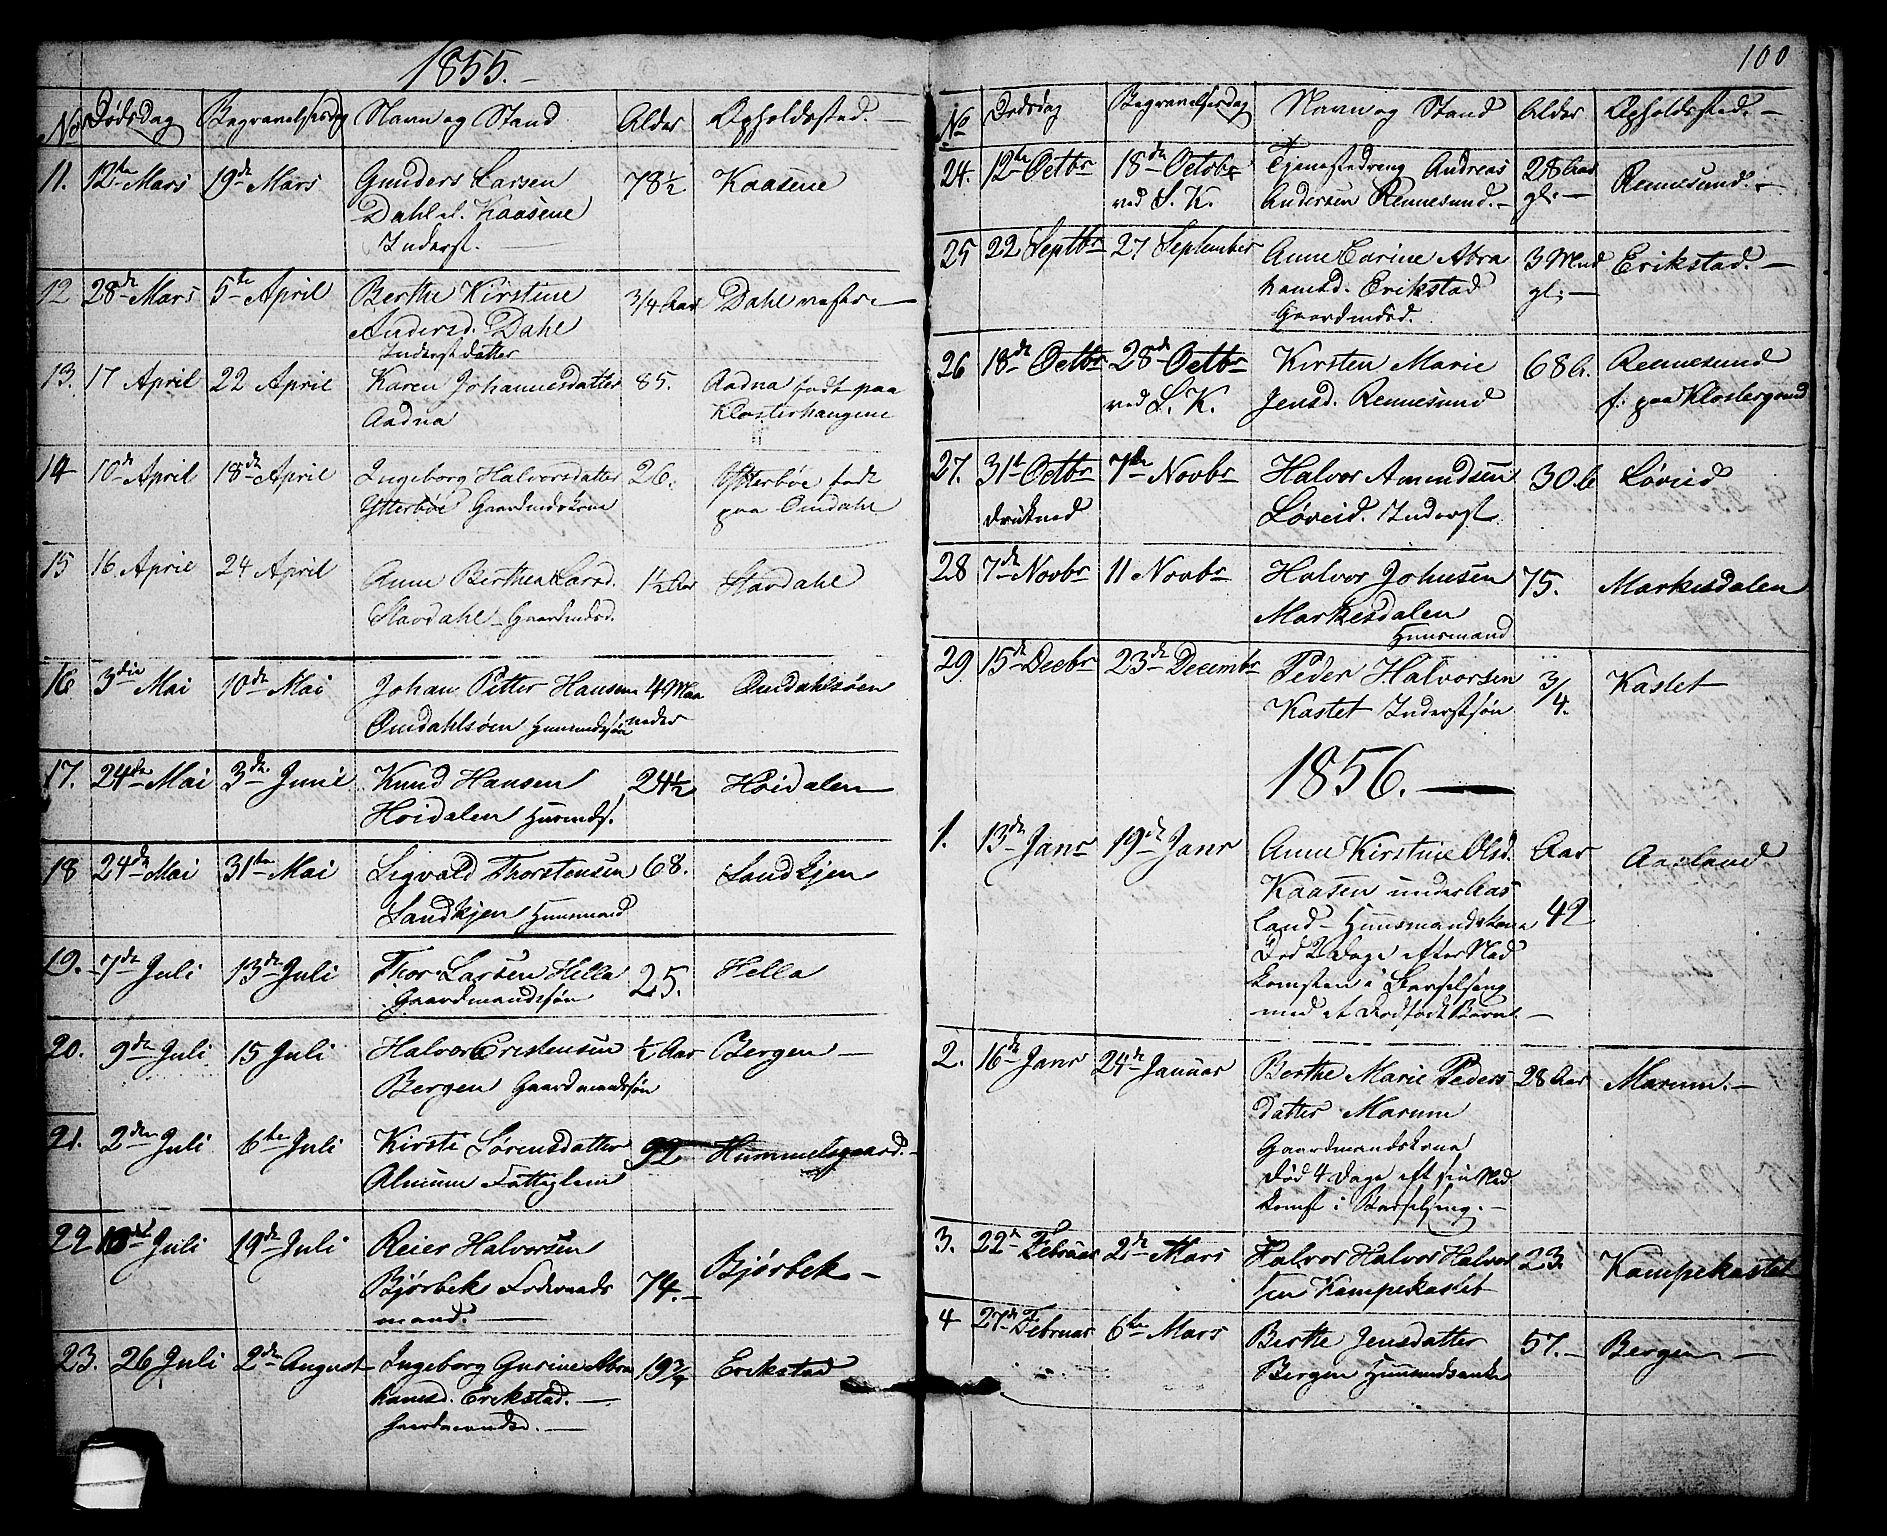 SAKO, Solum kirkebøker, G/Gb/L0001: Klokkerbok nr. II 1, 1848-1859, s. 100